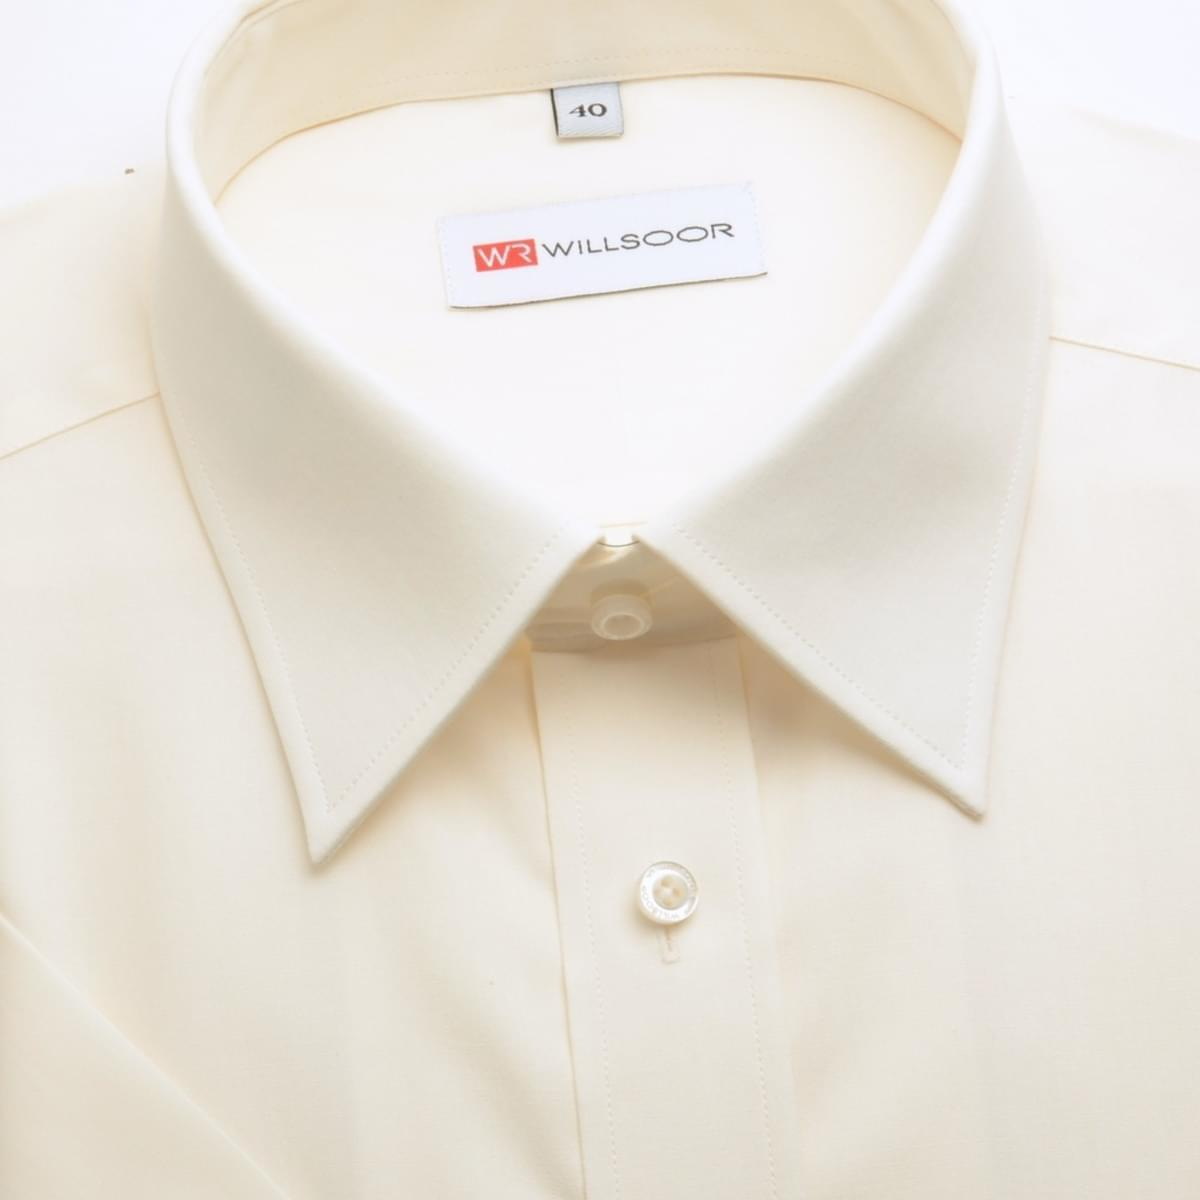 Willsoor Pánská košile WR Slim Fit (výška 176-182) 1793 176-182 / 39